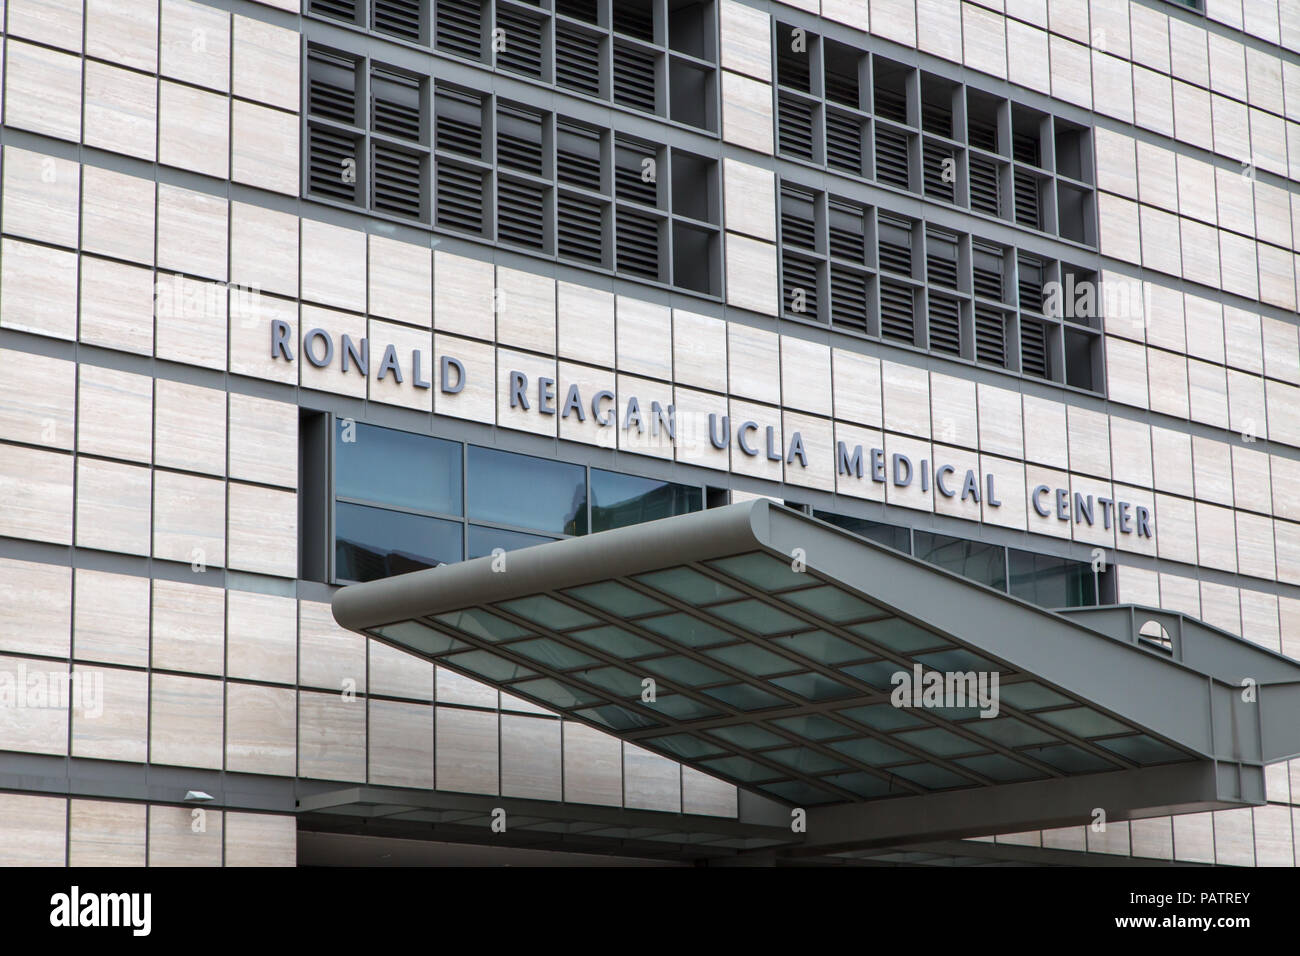 LOS ANGELES, CA/USA - MAY 25, 2015: Ronald Reagan UCLA Medical Center. T Stock Photo